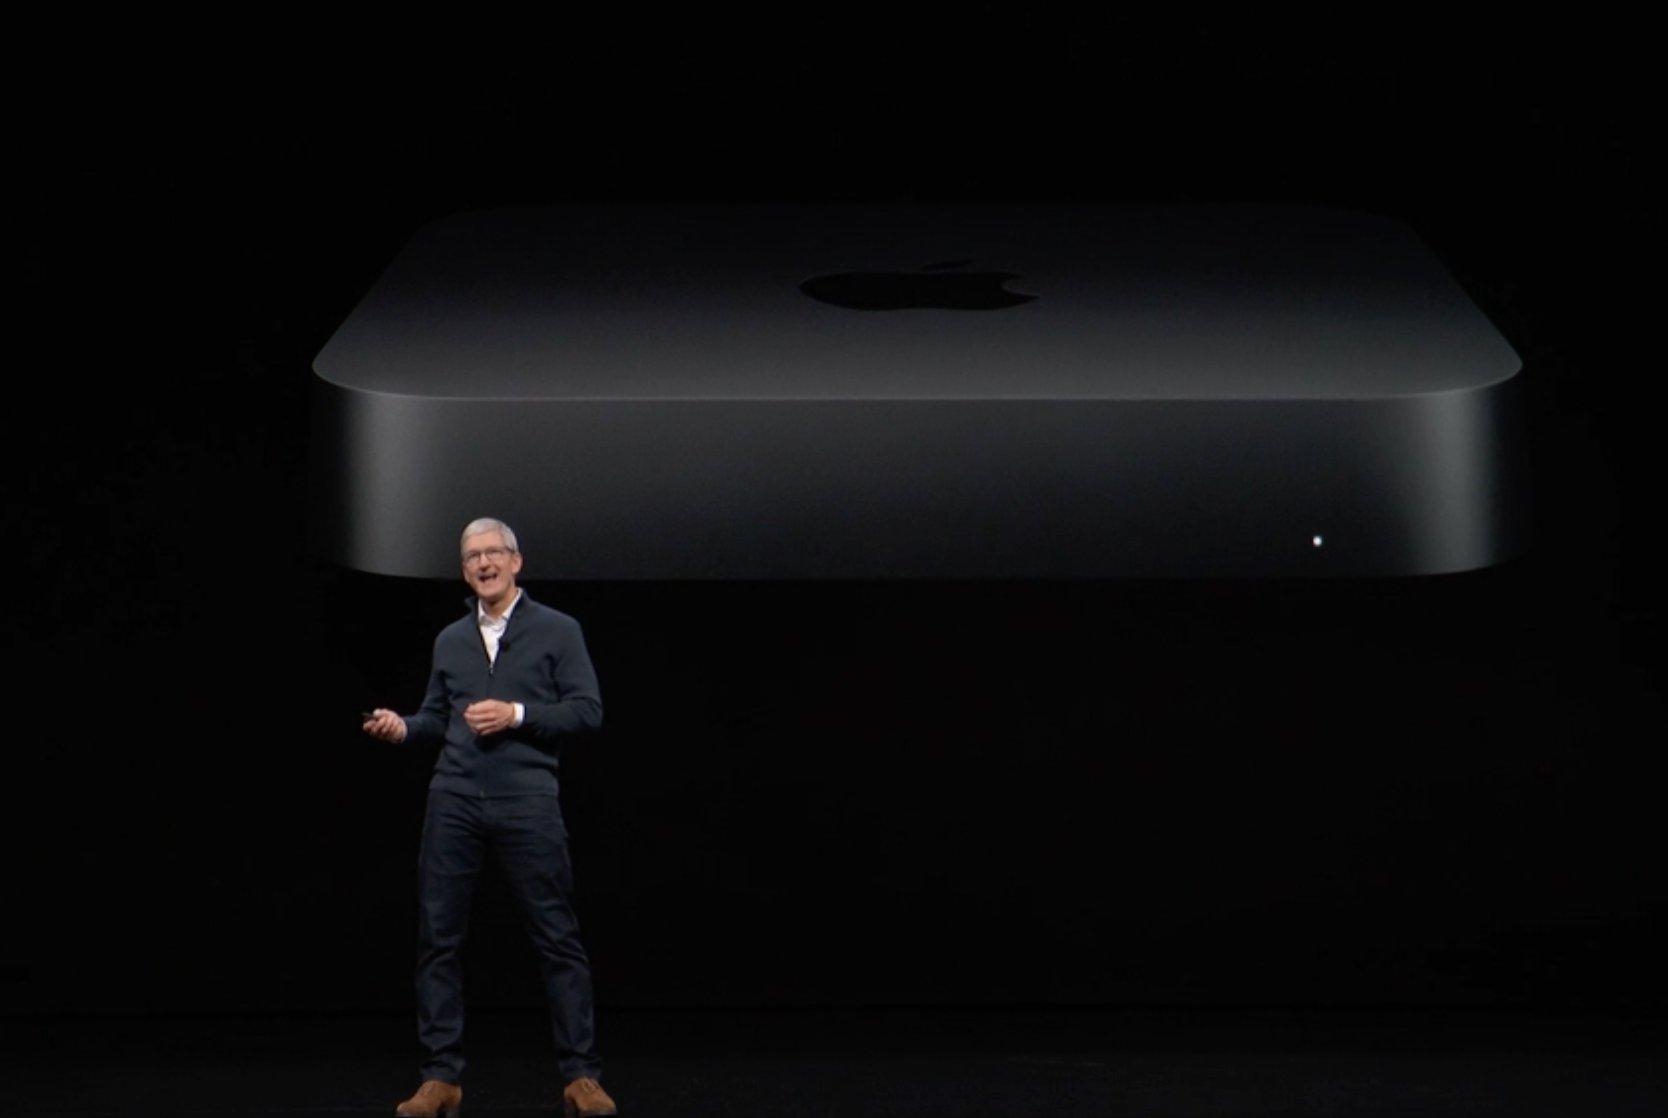 Tim Cook con el nuevo Mac mini